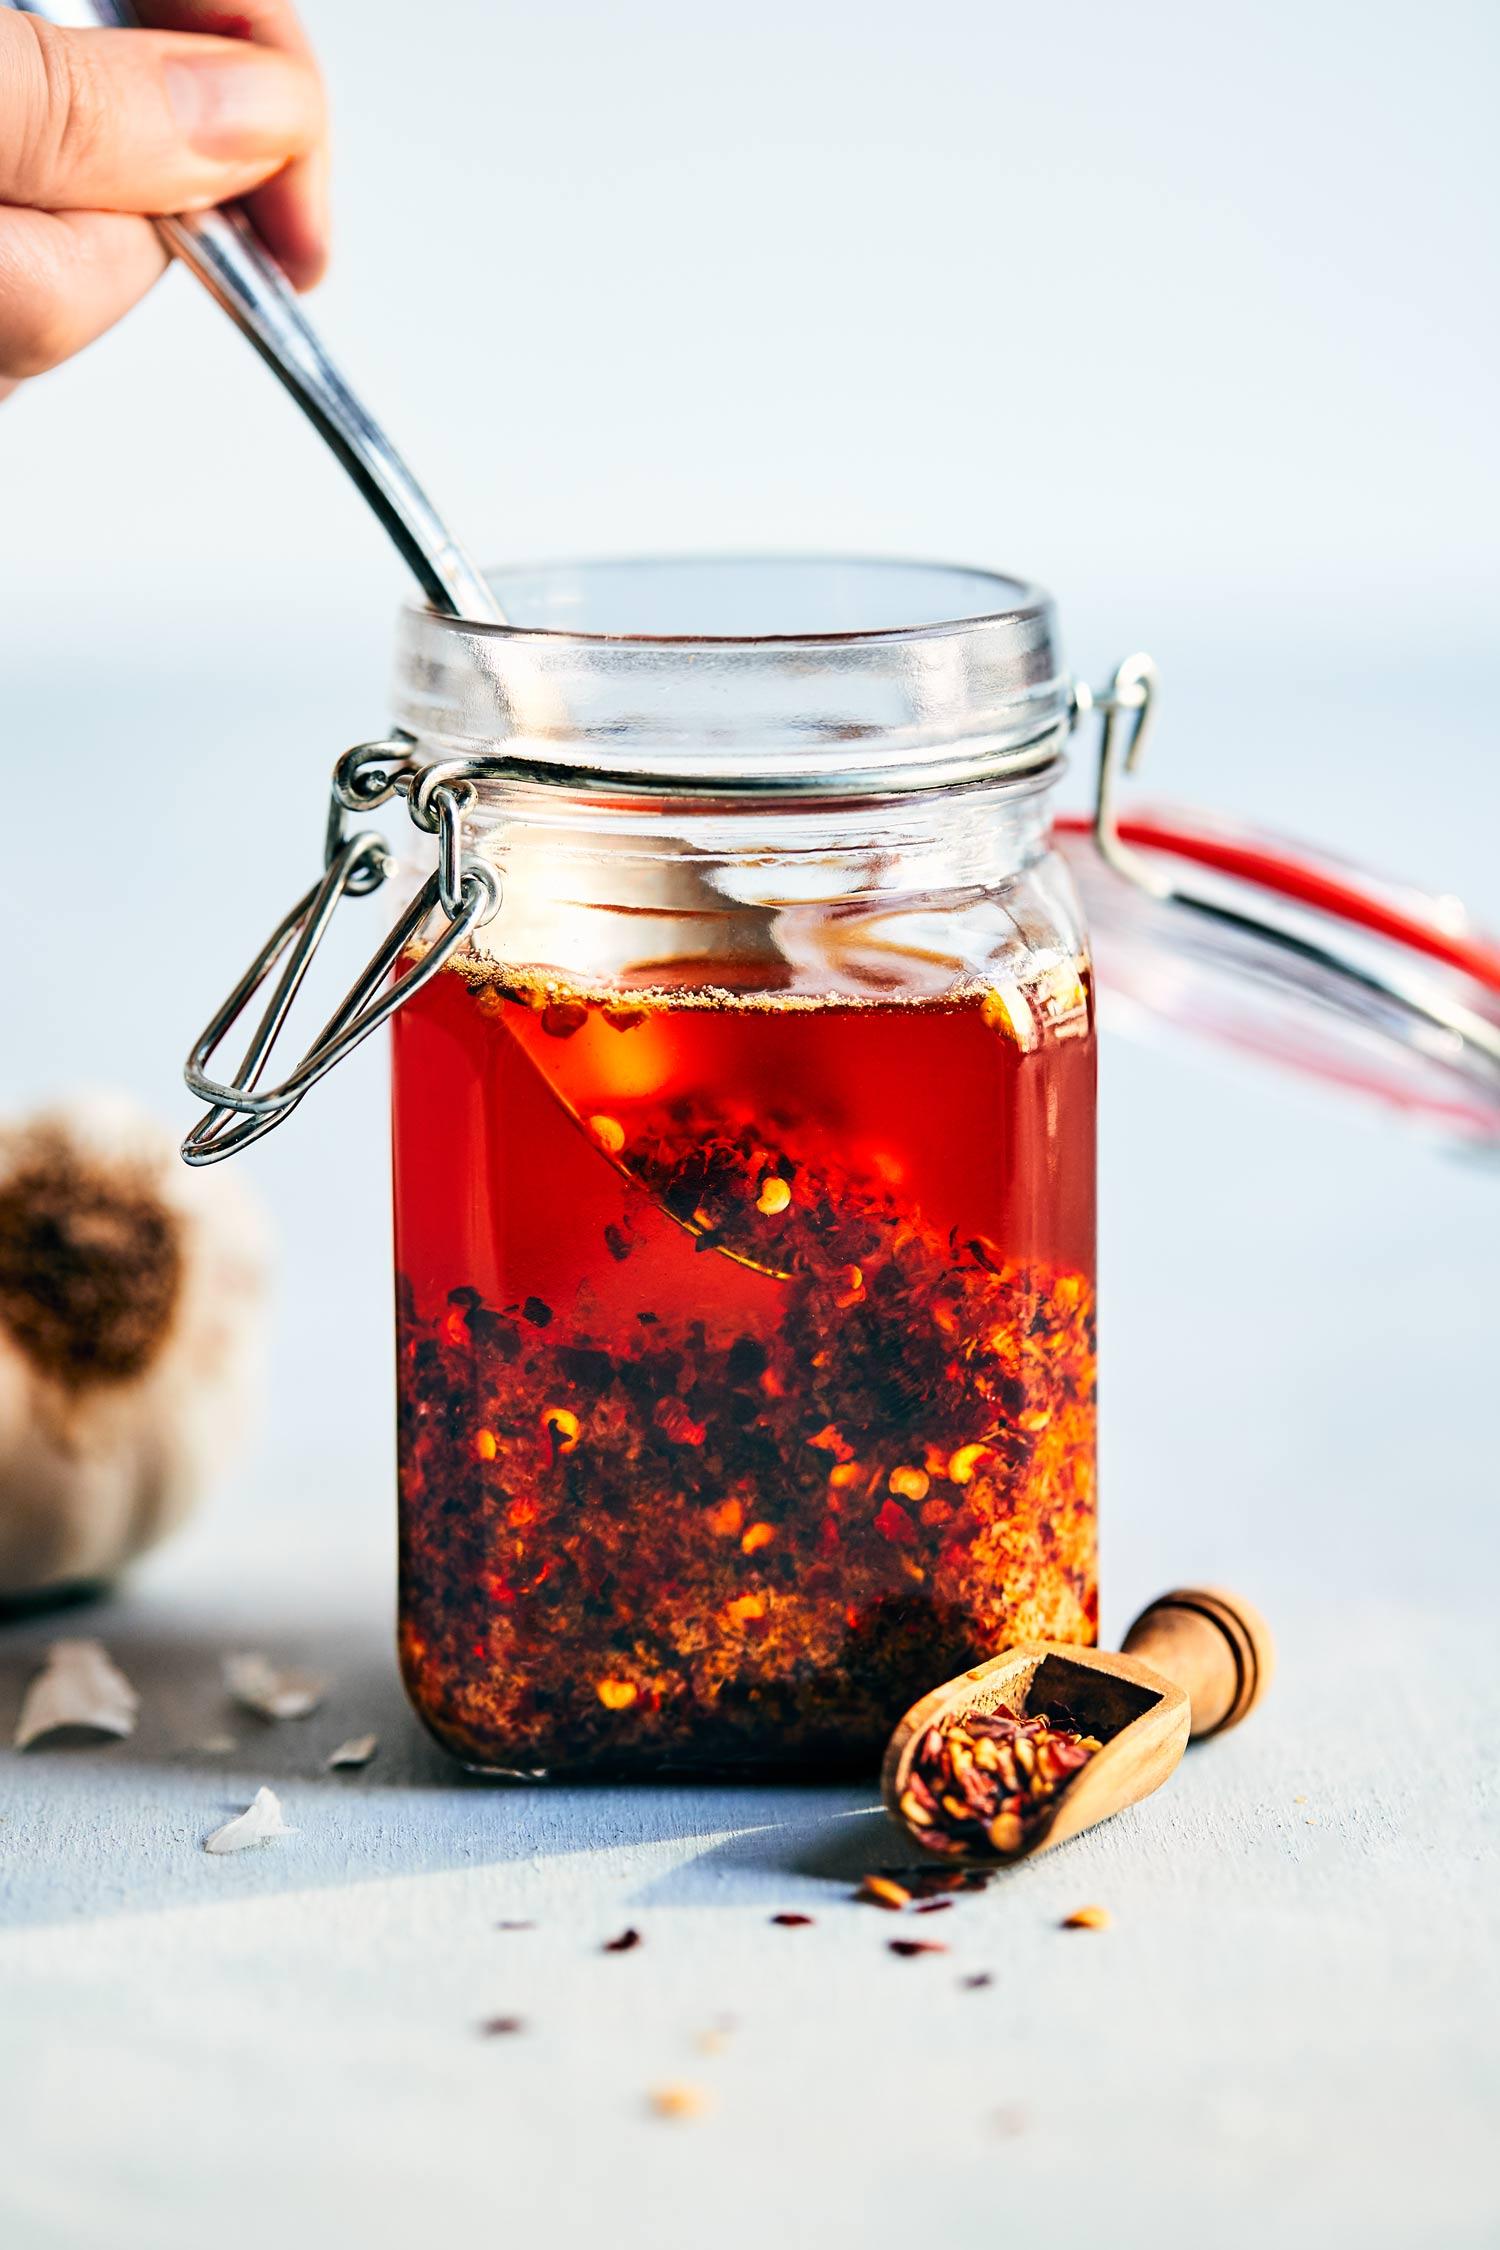 Homemade Chili Garlic Oil | Evergreen Kitchen | Vegan & Gluten Free